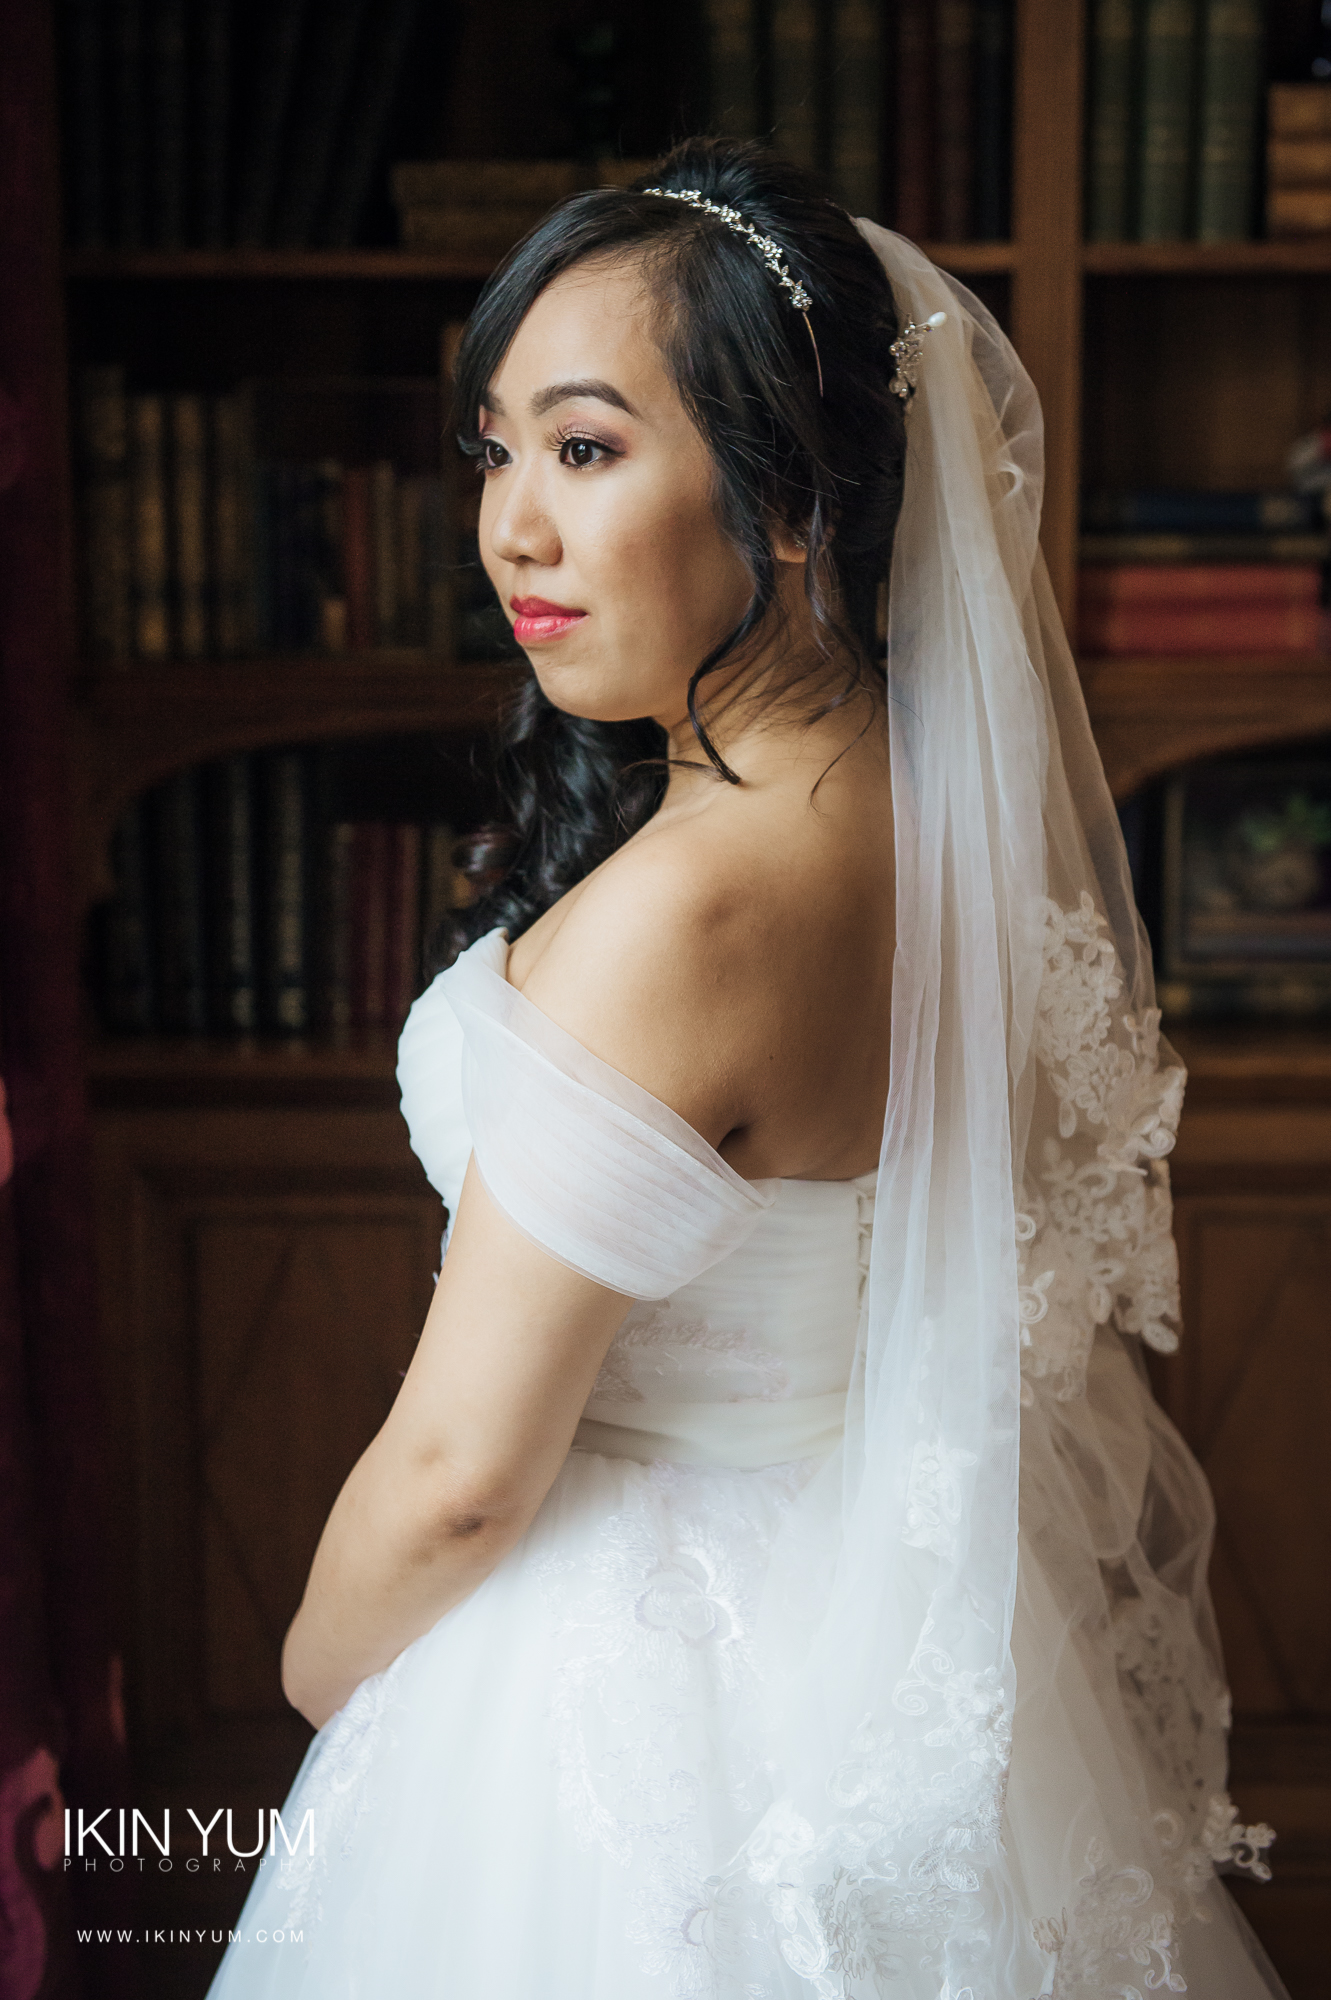 Hampton Manor Wedding - Ikin Yum Photography -057.jpg